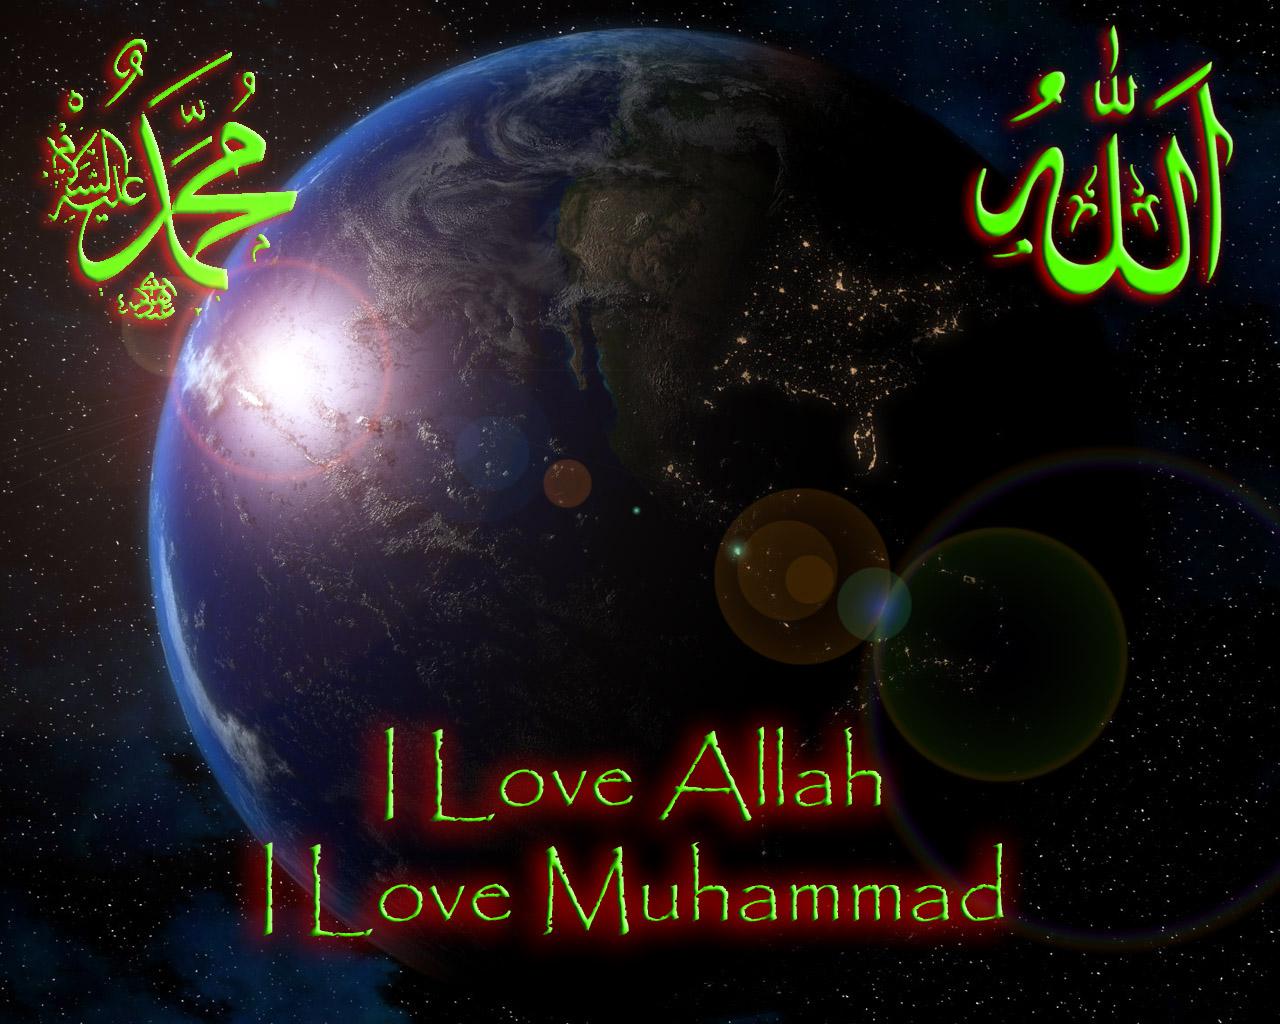 http://3.bp.blogspot.com/-PbvjRoYDV2A/UIPzwsXmQgI/AAAAAAAAAAg/t4VNbldrTsg/s1600/Wallpaper+Kaligrafi+Islami.jpg